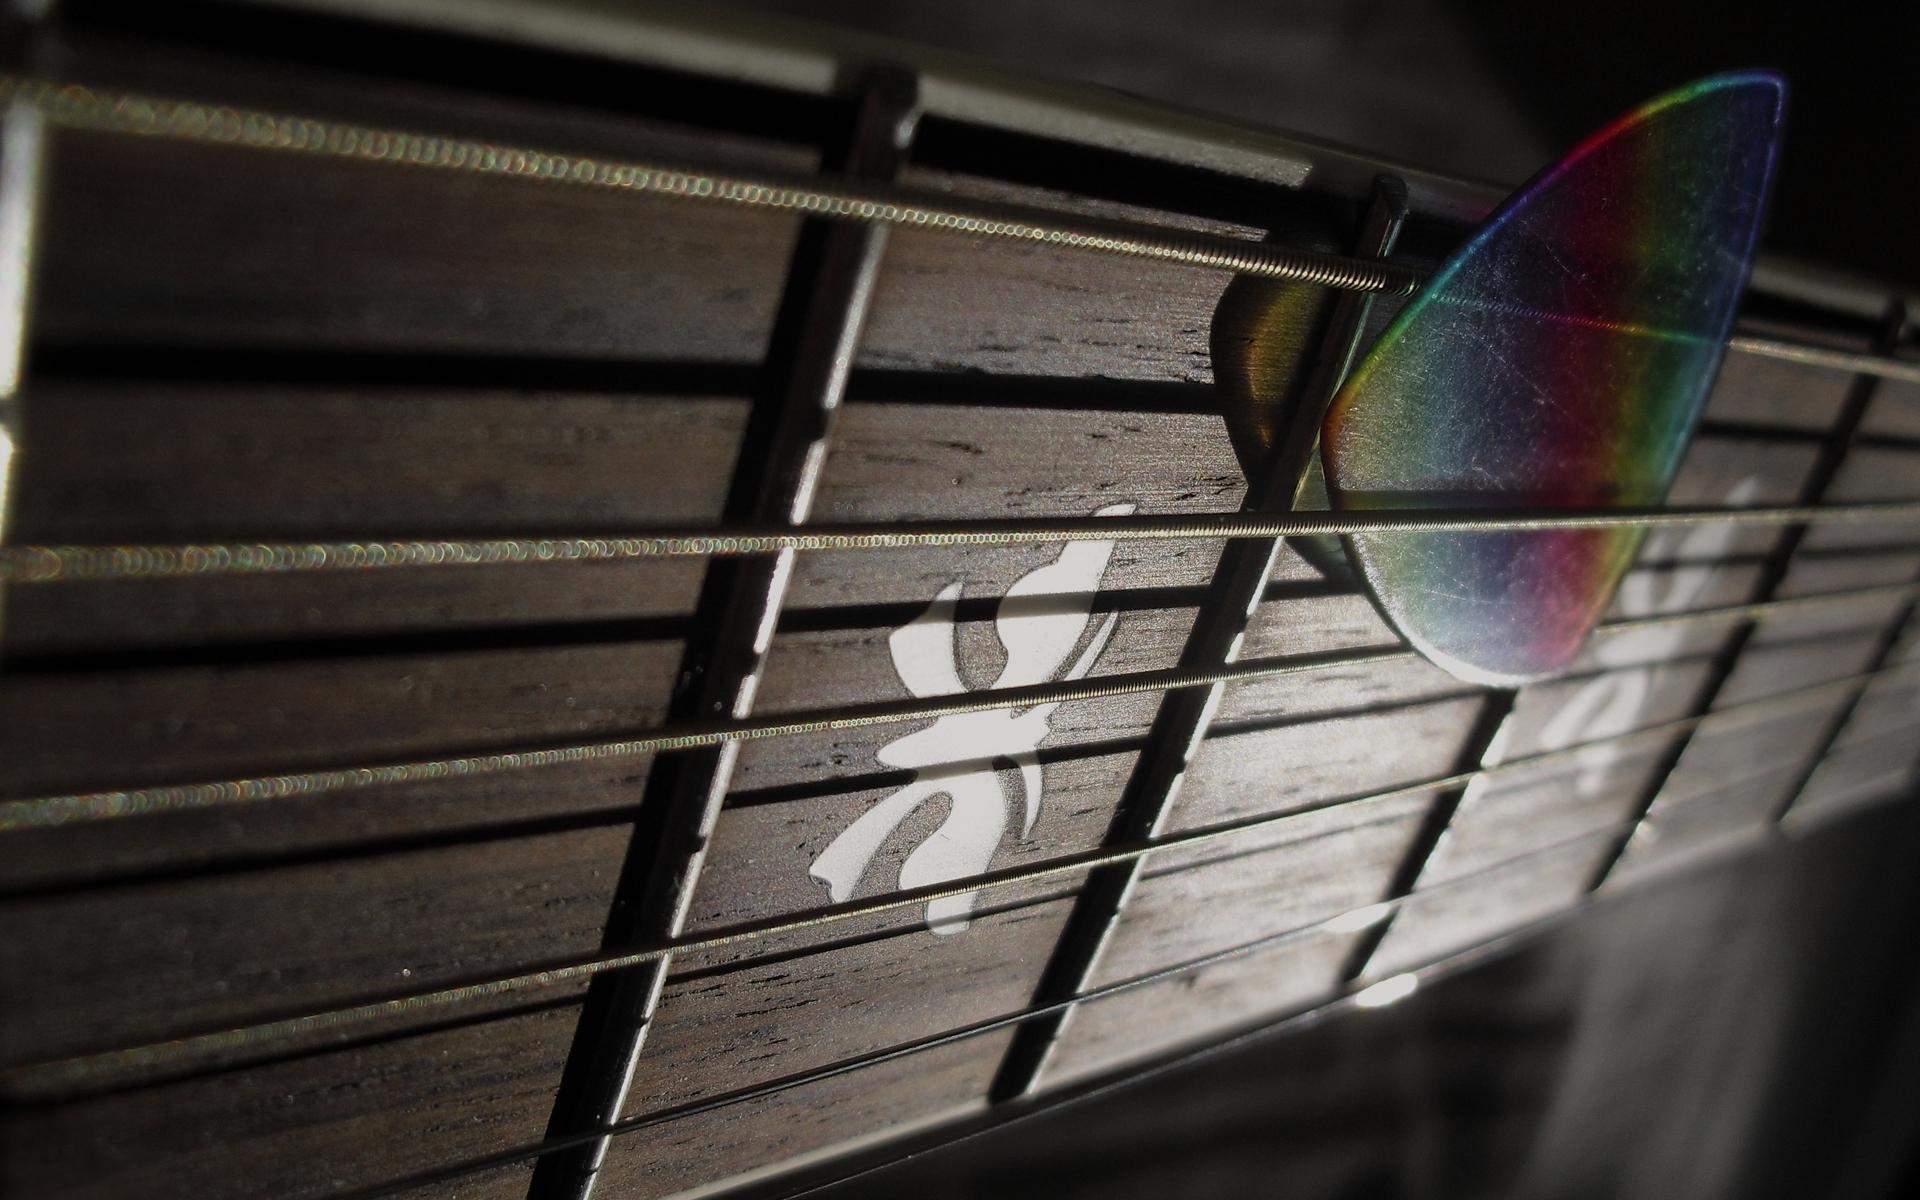 Christian Wallpaper Iphone 6 Guitare Full Hd Fond D 233 Cran And Arri 232 Re Plan 1920x1200